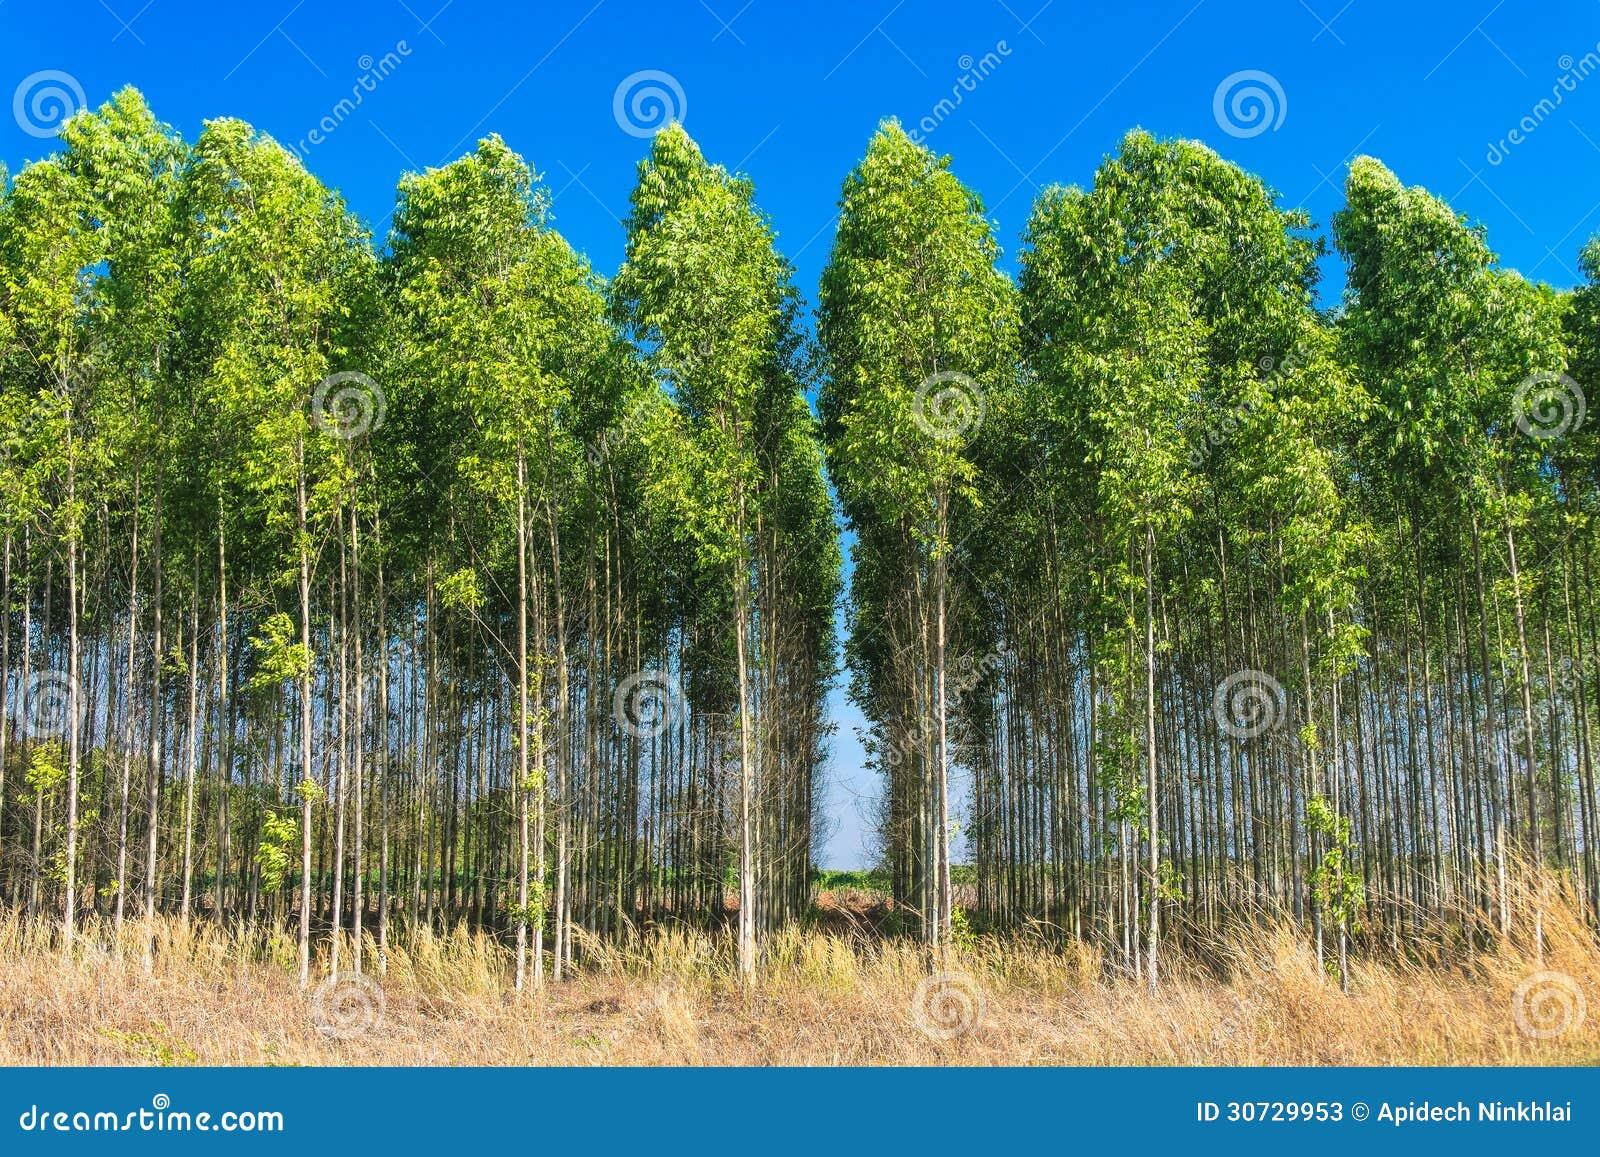 champ d 39 arbre d 39 eucalyptus image stock image du vert 30729953. Black Bedroom Furniture Sets. Home Design Ideas